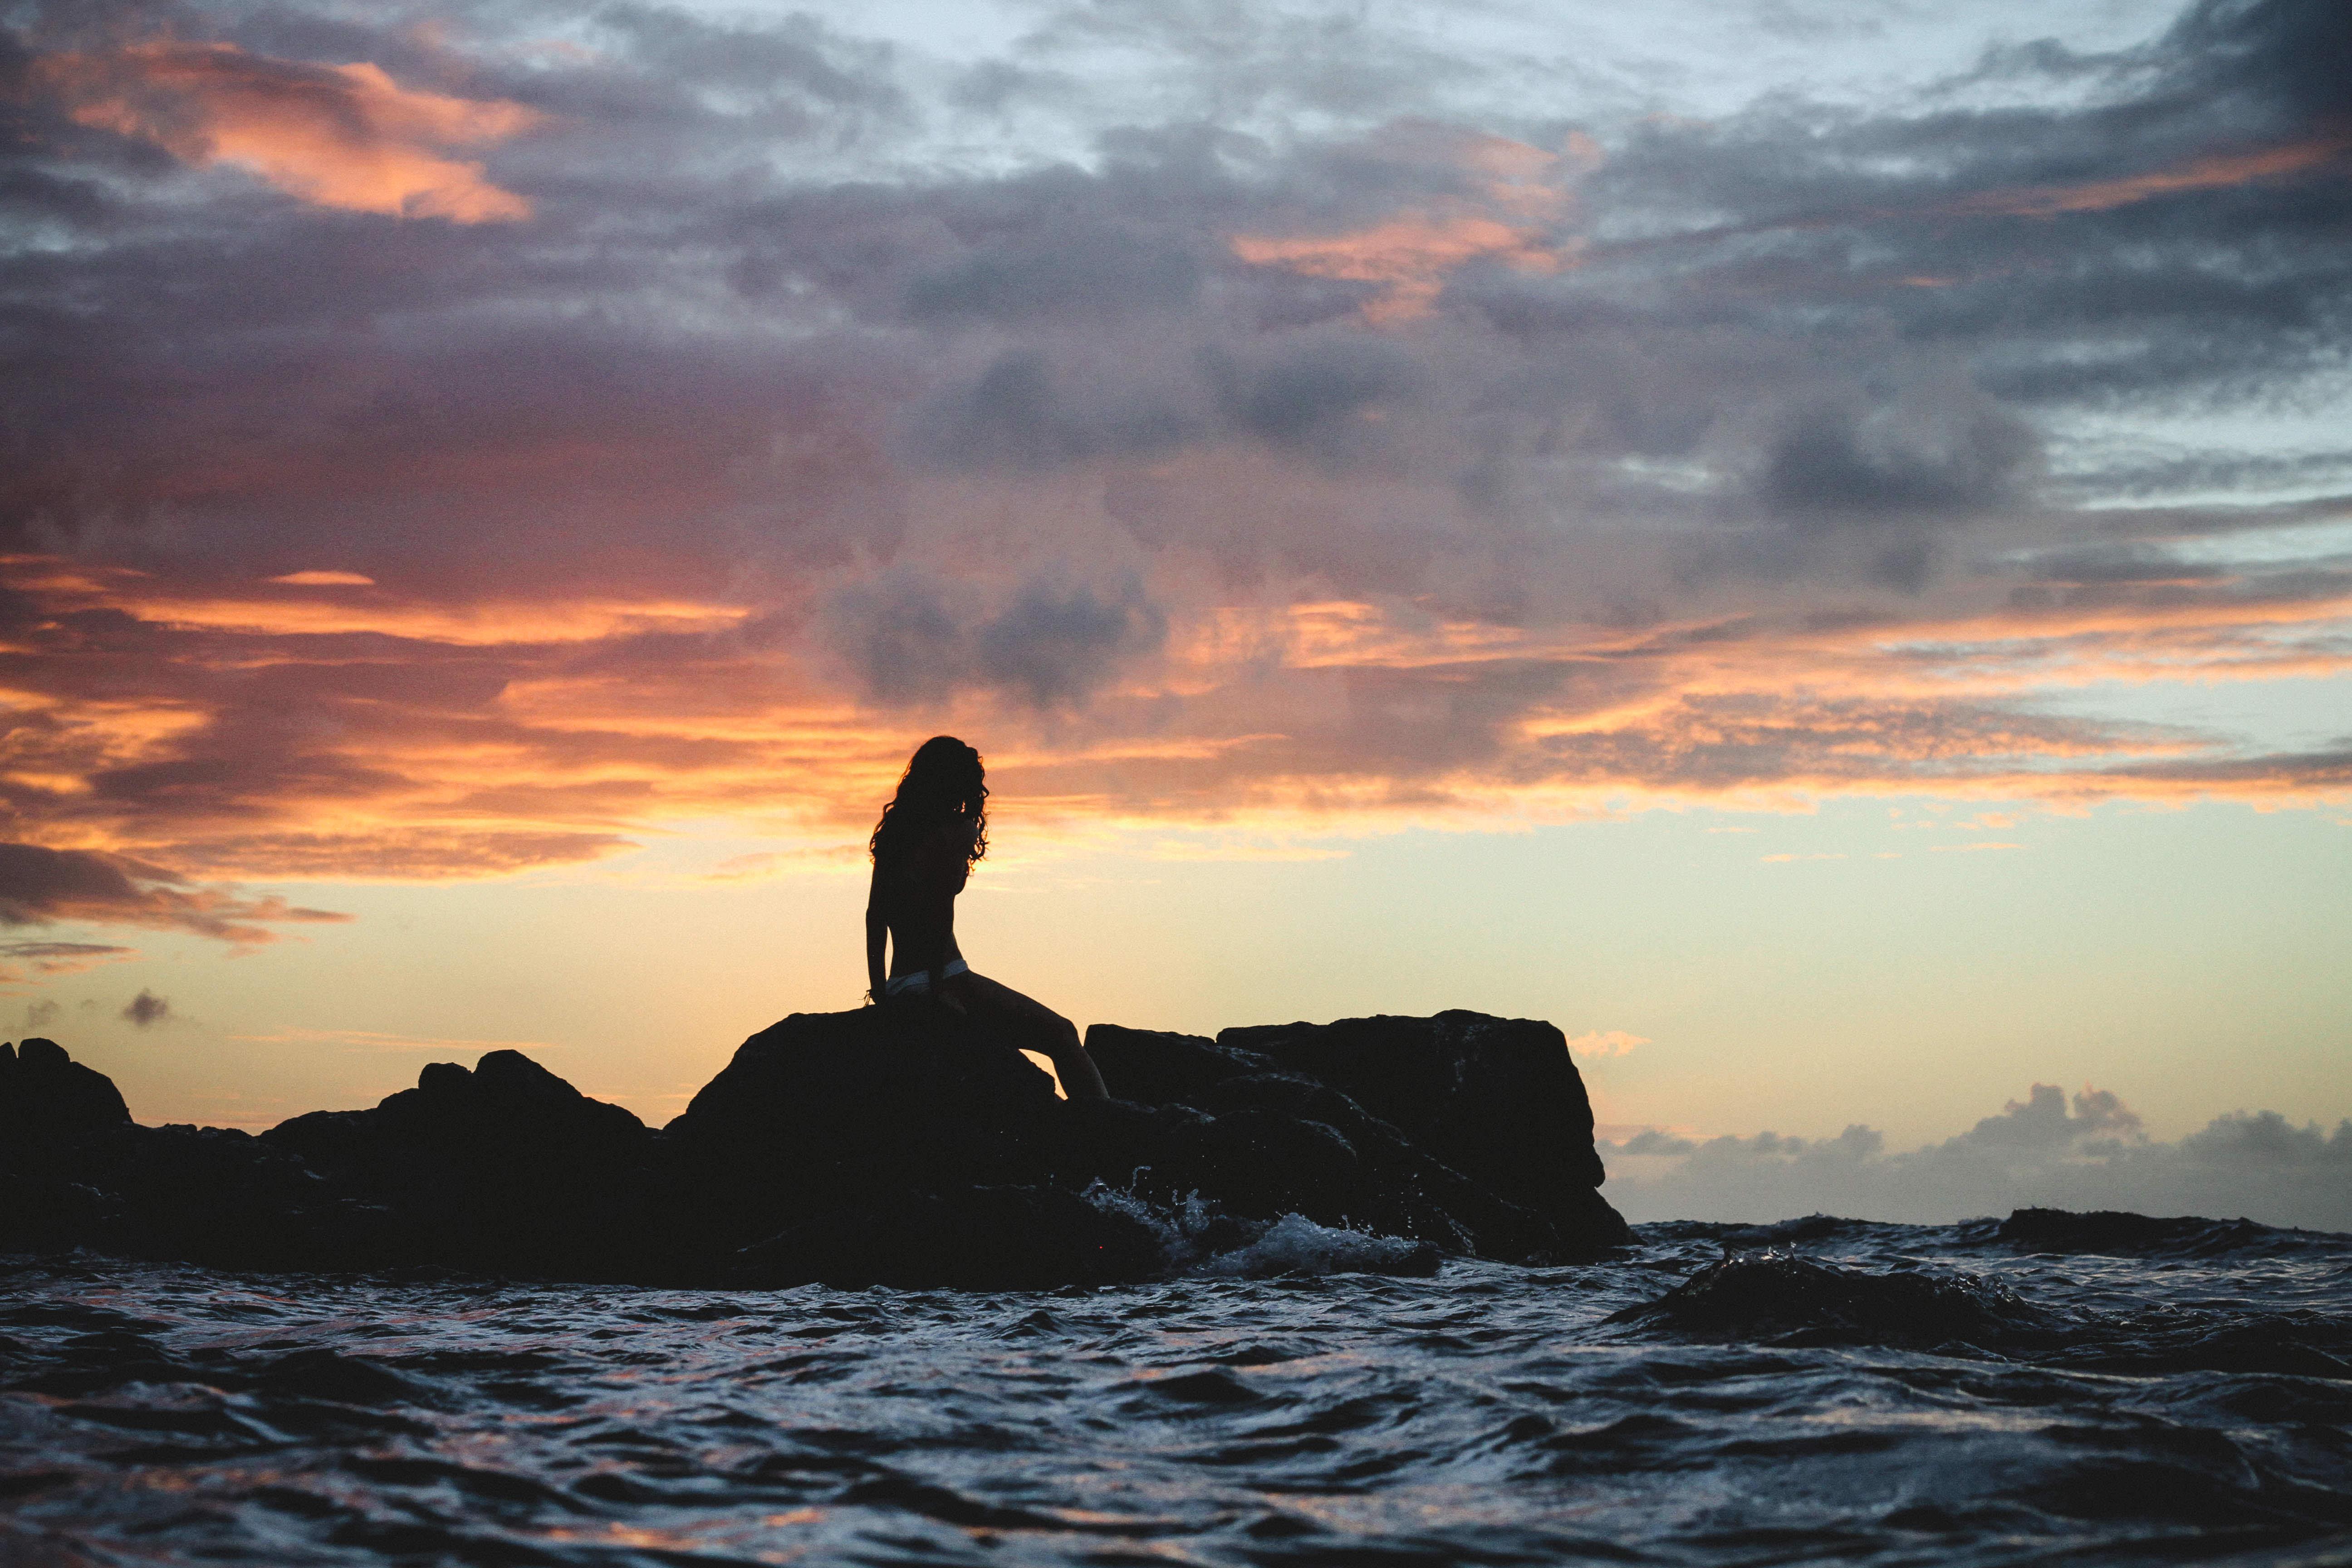 картинки с силуэтом у моря бланка будут переданы